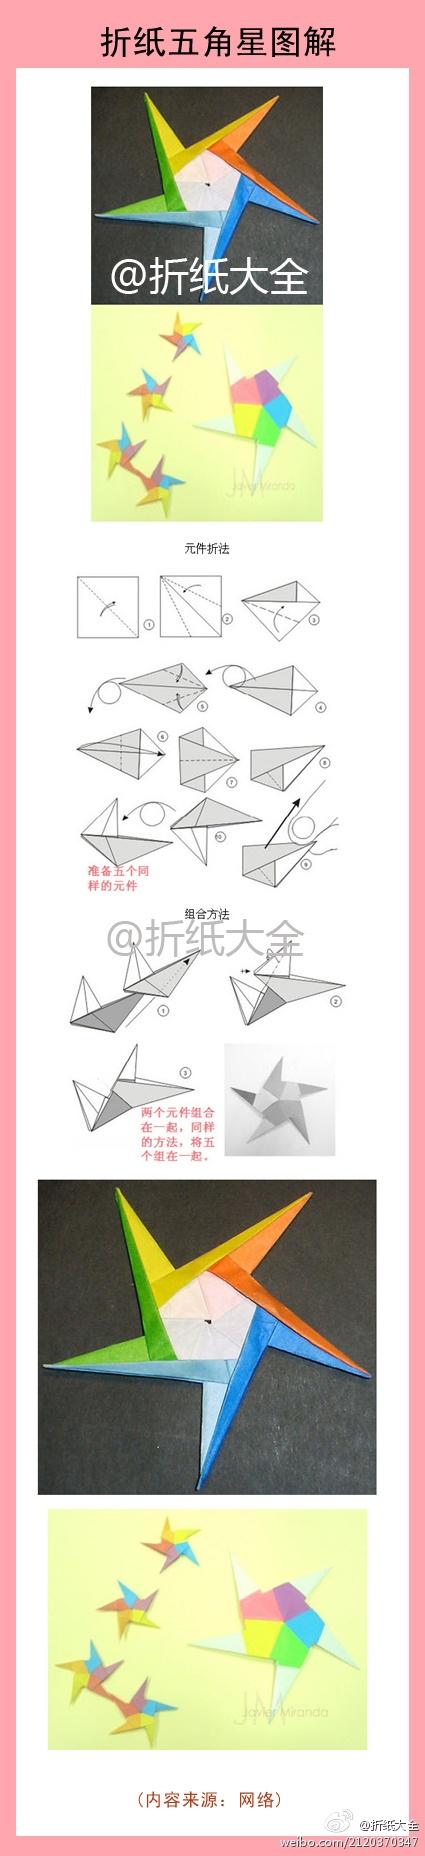 Pentagonal star